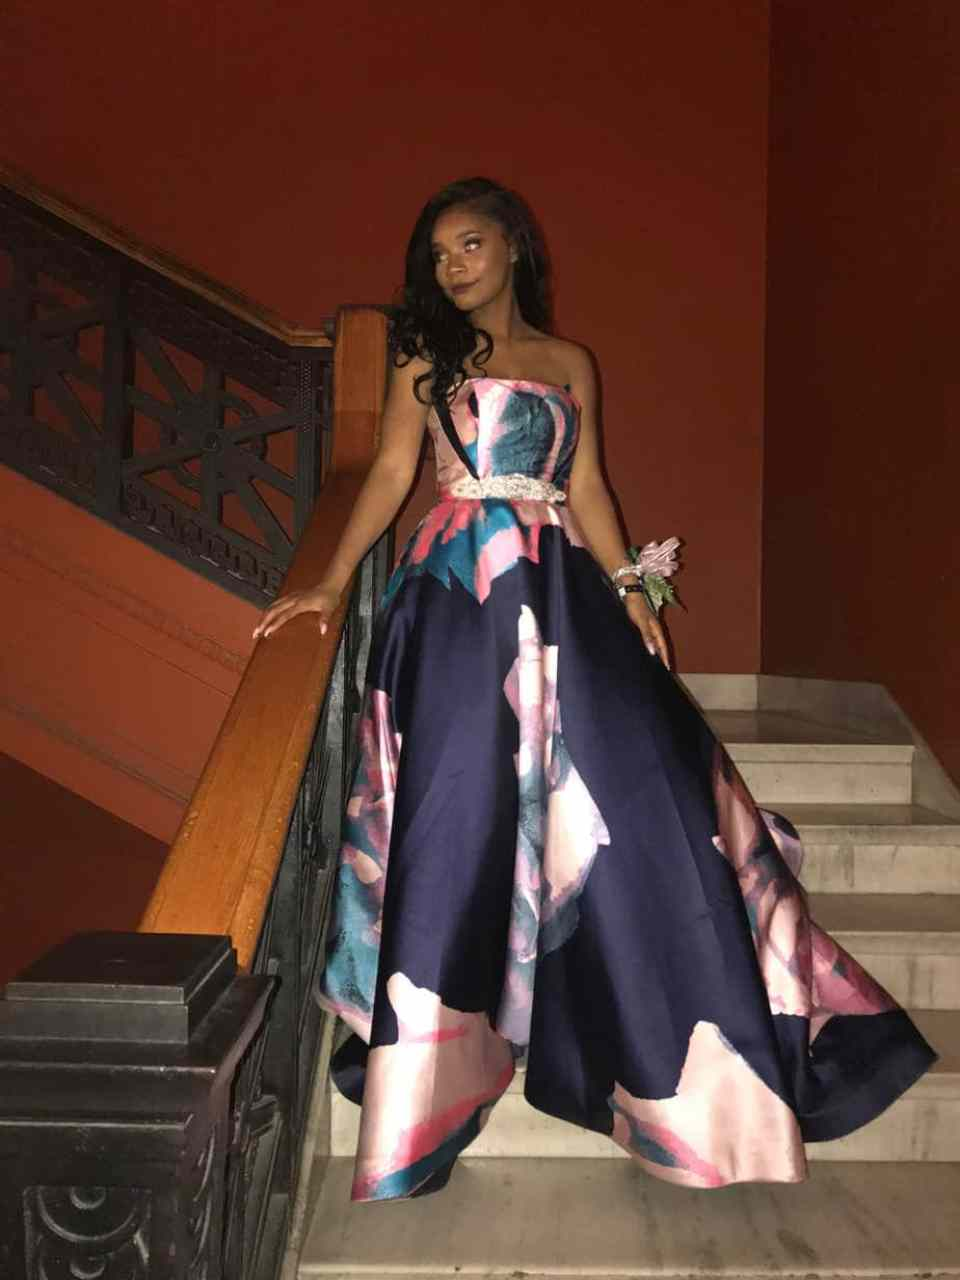 Kaylah Bell wearing her prom dress